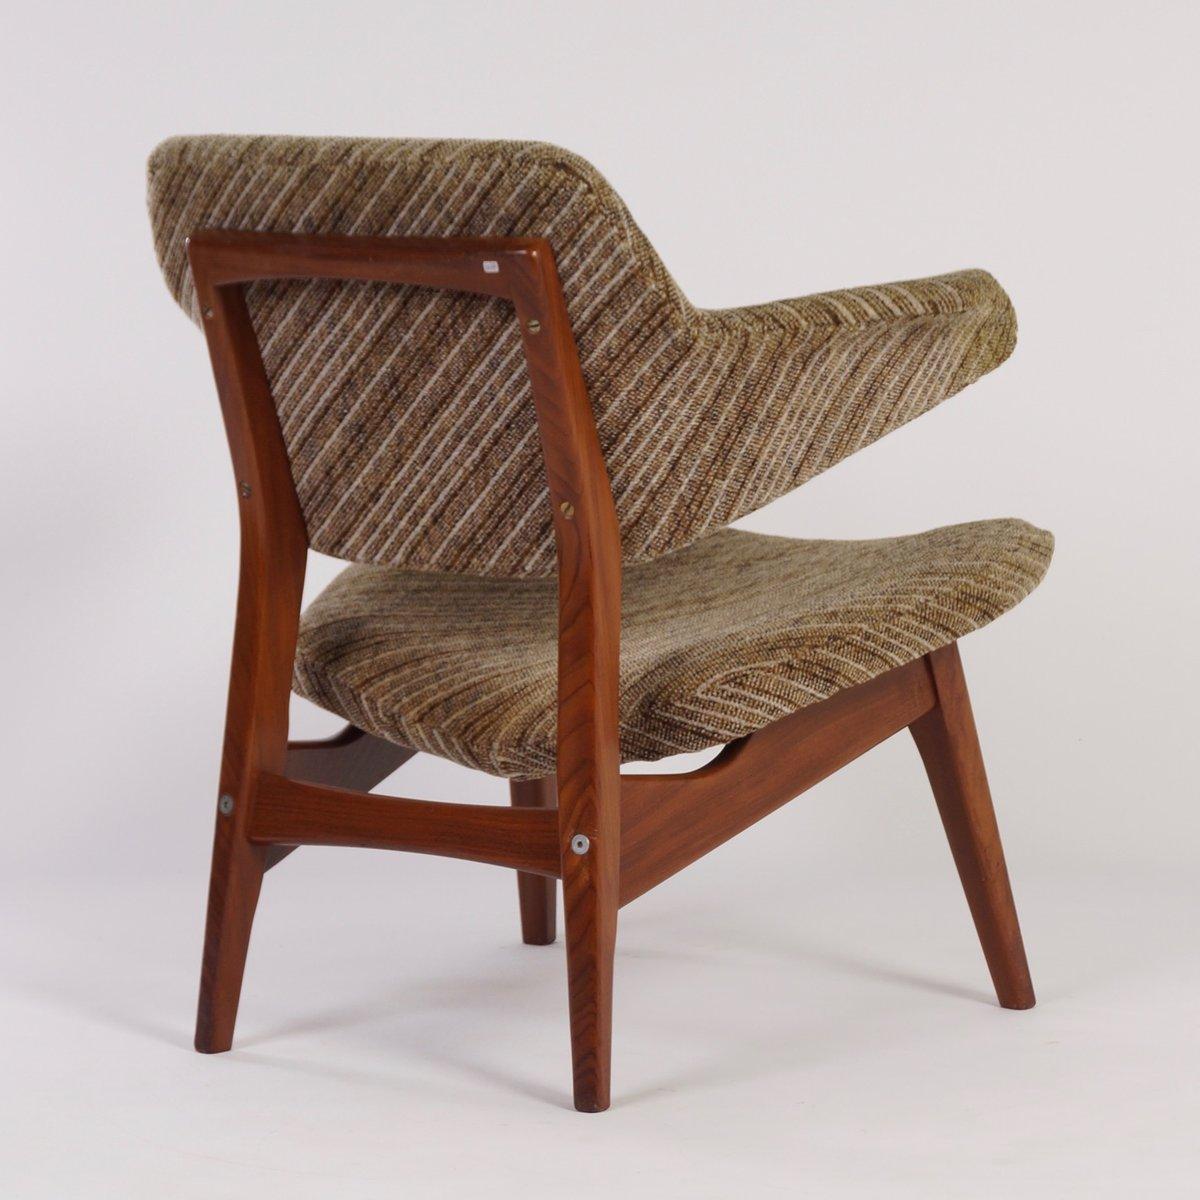 sedia vintage di louis van teeffelen per wébé, anni '60 in vendita ... - Sedie Vintage Anni 60